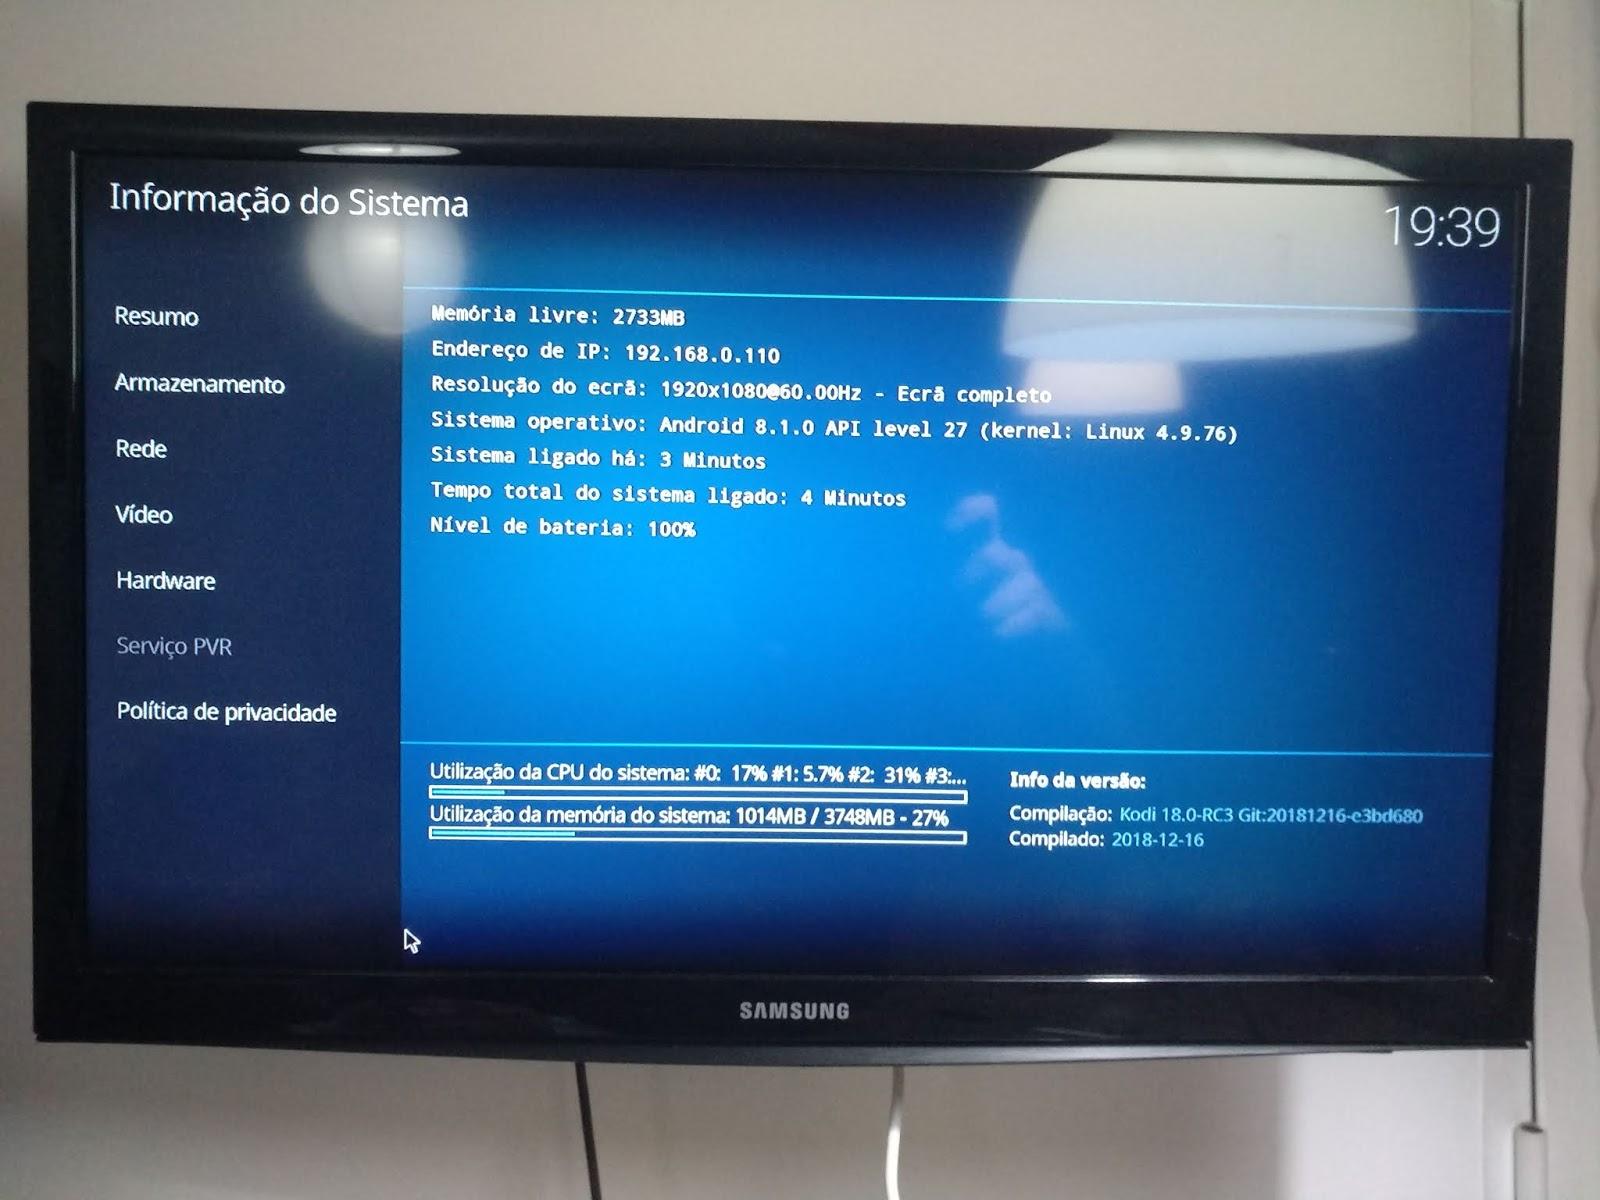 Beelink GT1 Mini TV Box - Analise e Desempenho - ITO - NET Things